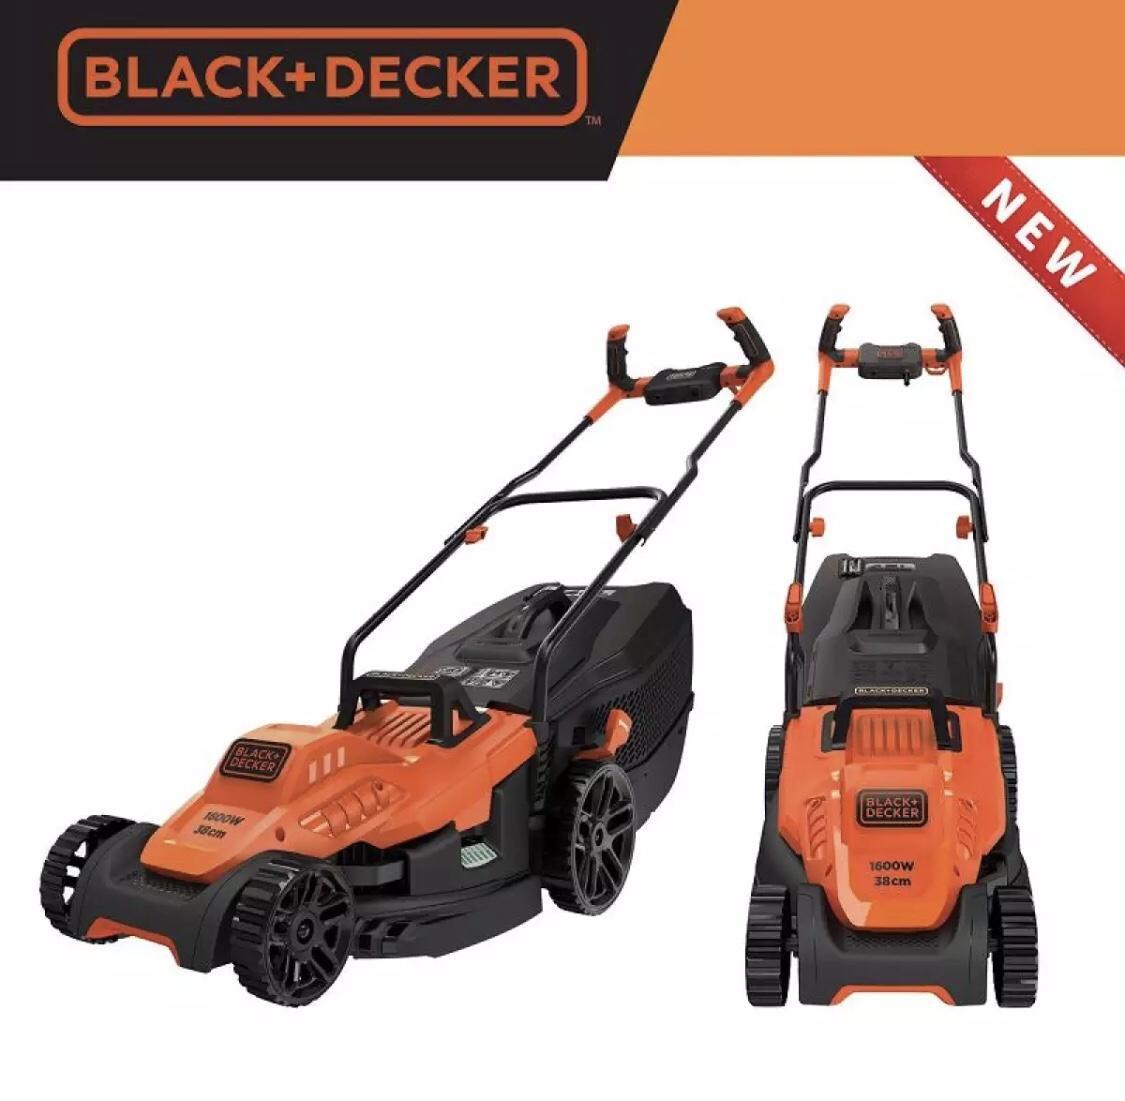 1600W Máy cắt cỏ xe đẩy 38cm Black+Decker BEMW471BH-B1 (thay thế cho EMAX38)